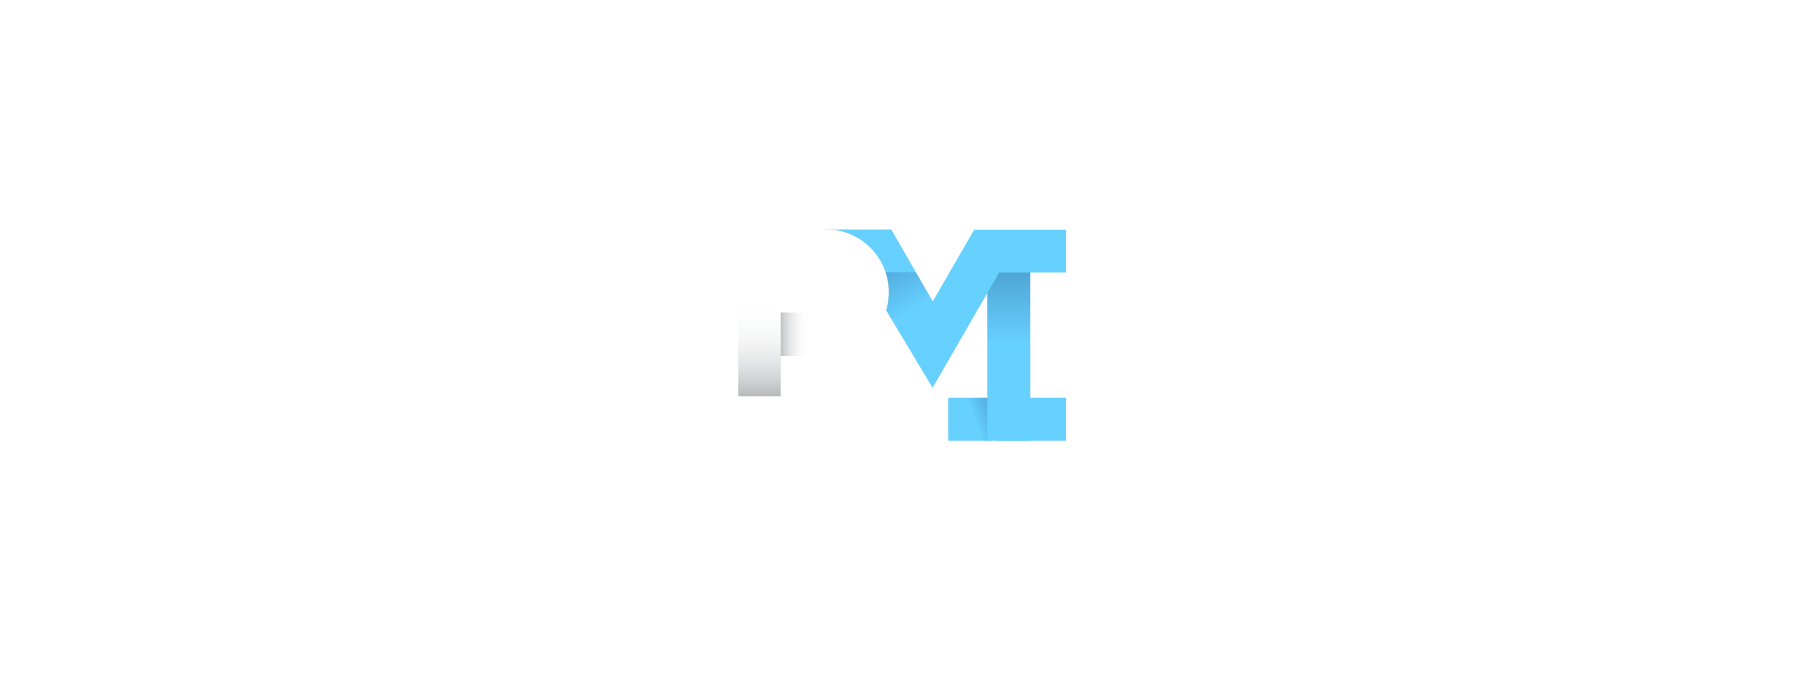 BM90_logo_Color_Icon-IM_REV copy 5.png